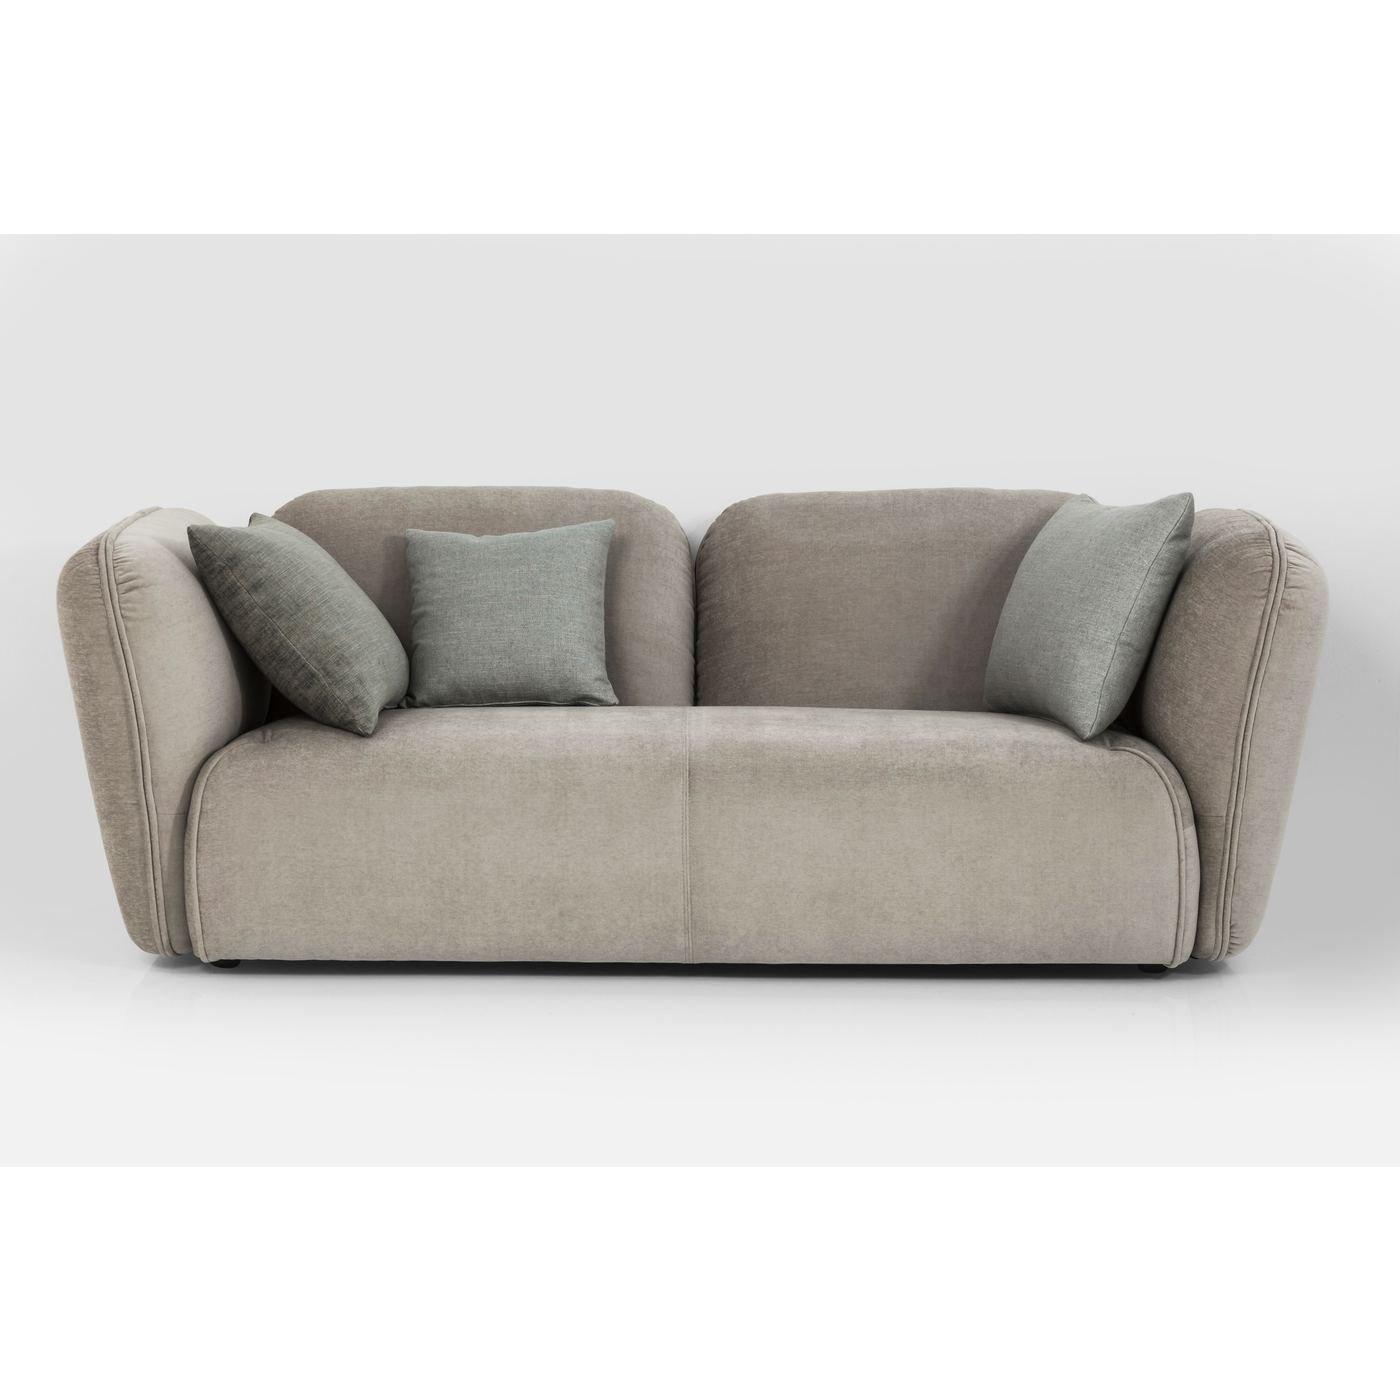 Kare Design + Studio Divani sofá Nuvola - 208: Amazon.es: Hogar